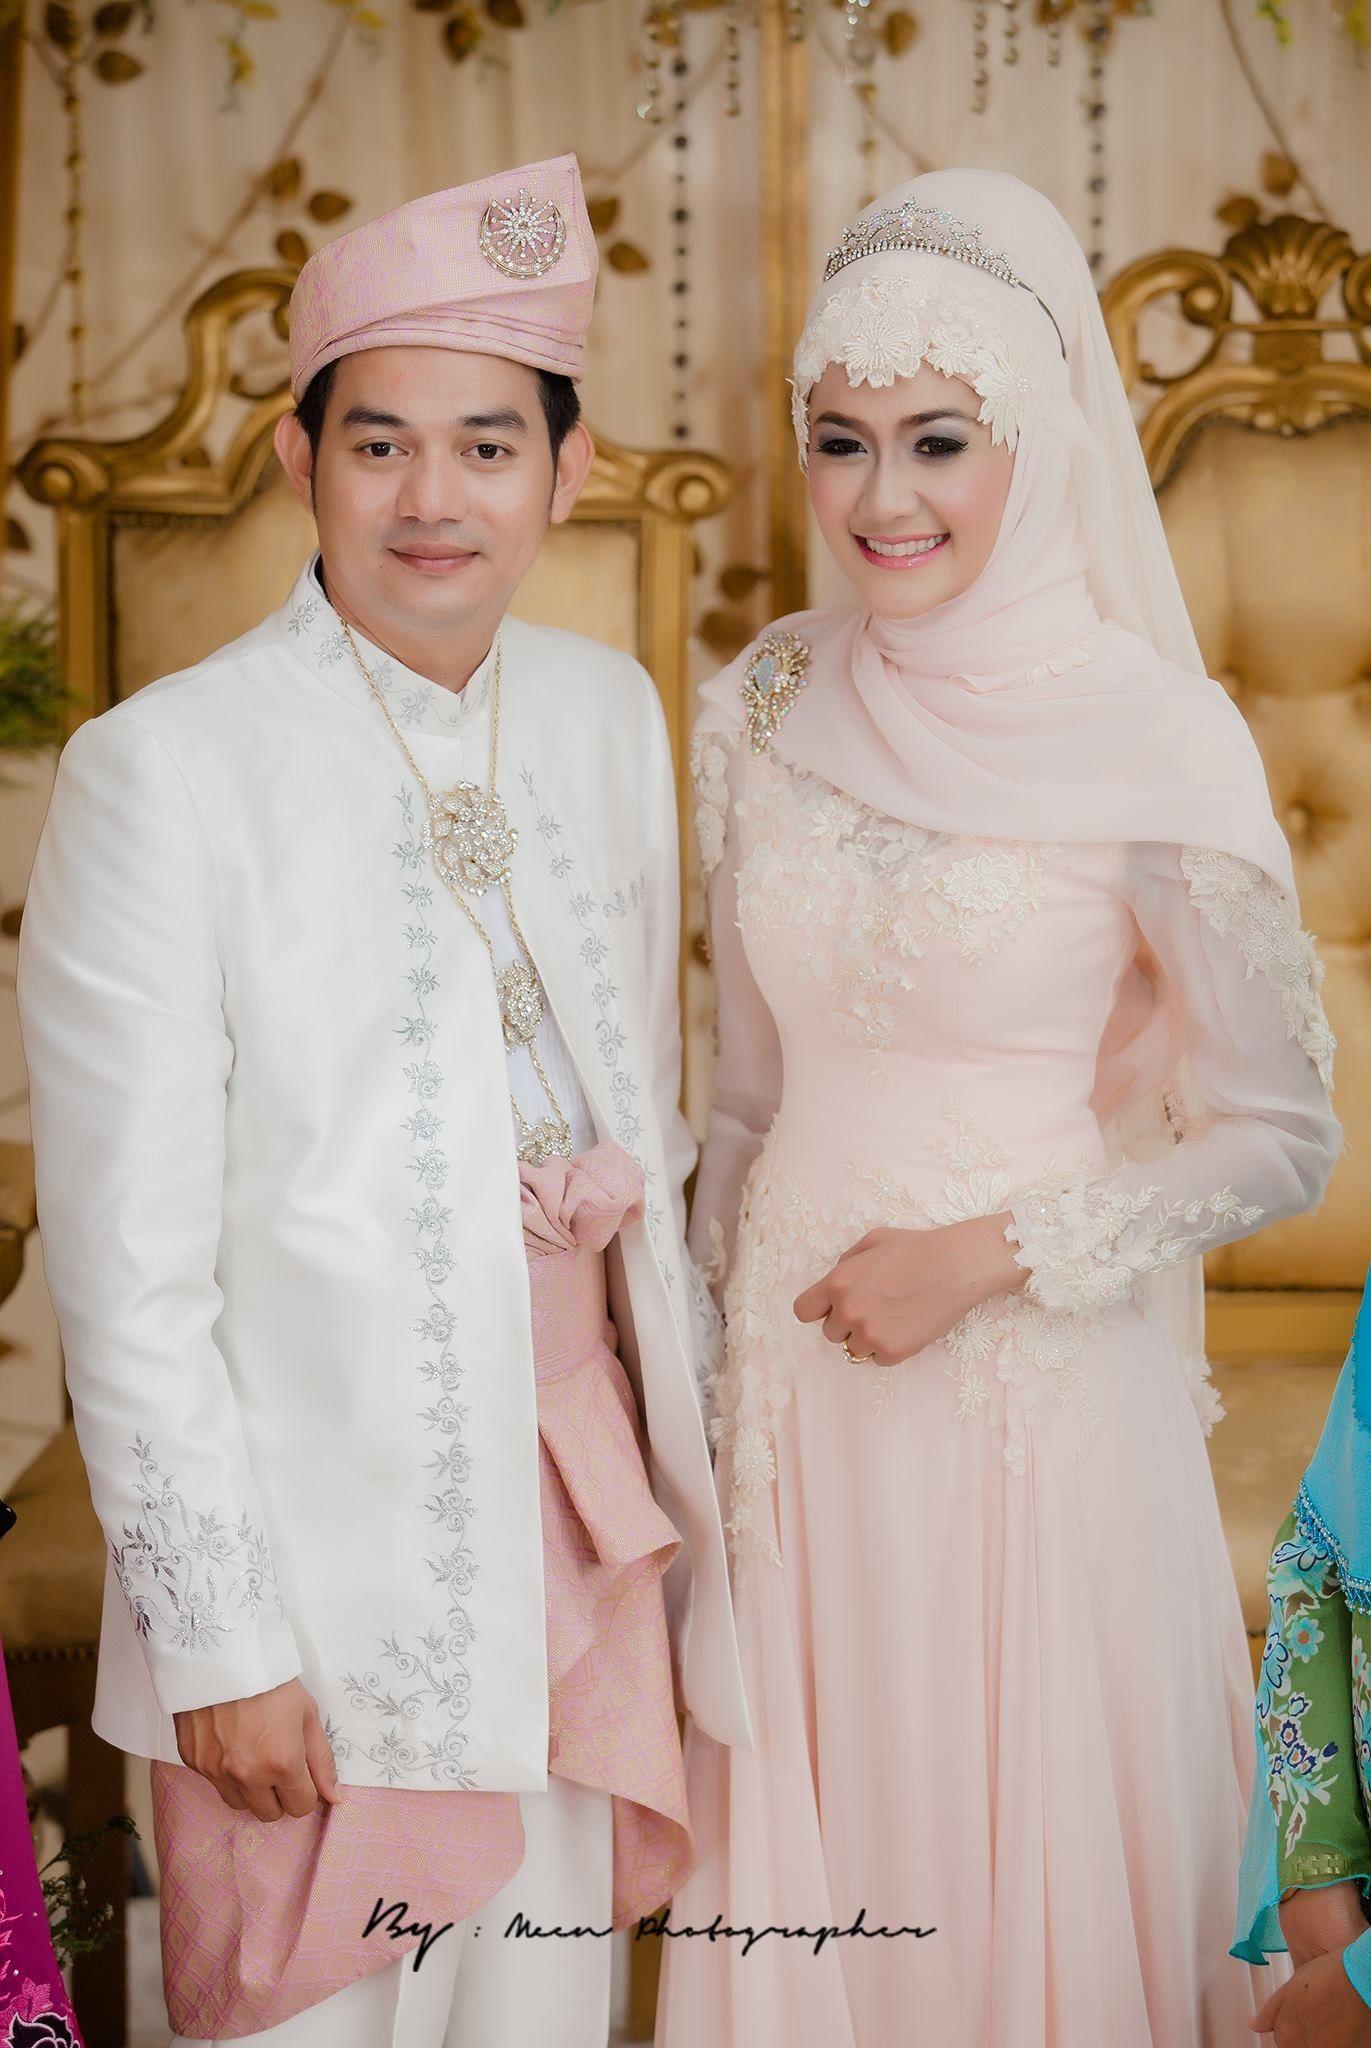 Wedding wedding dress pinterest wedding kebaya and wedding